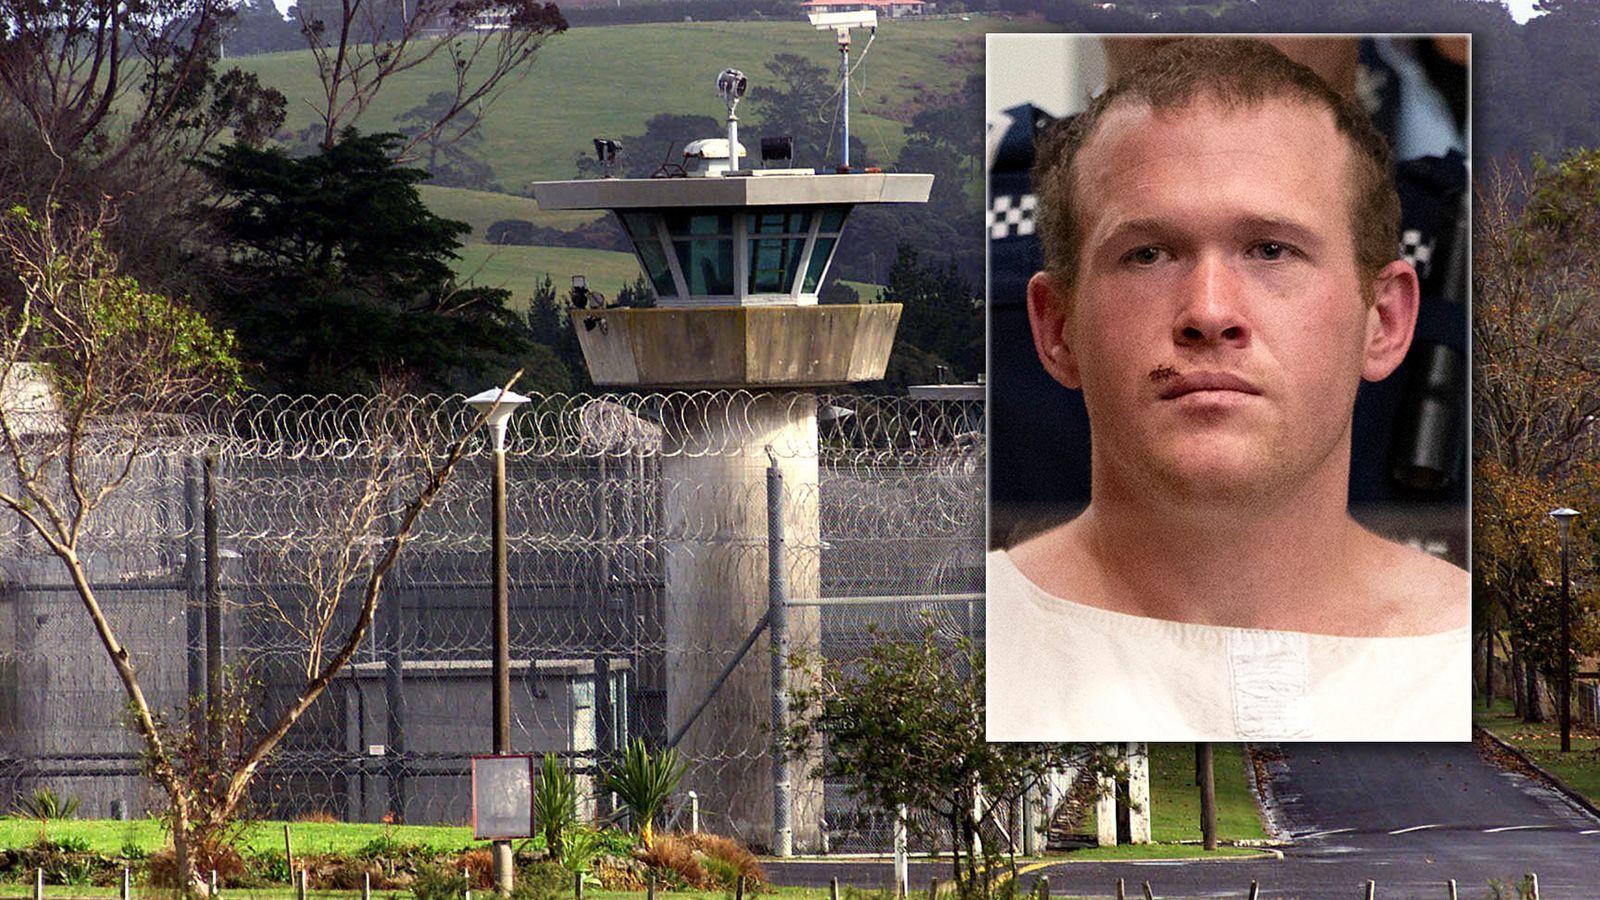 Surat Pembantai Christchurch Lolos Sensor Pemerintah, PM Ardern Marah Besar